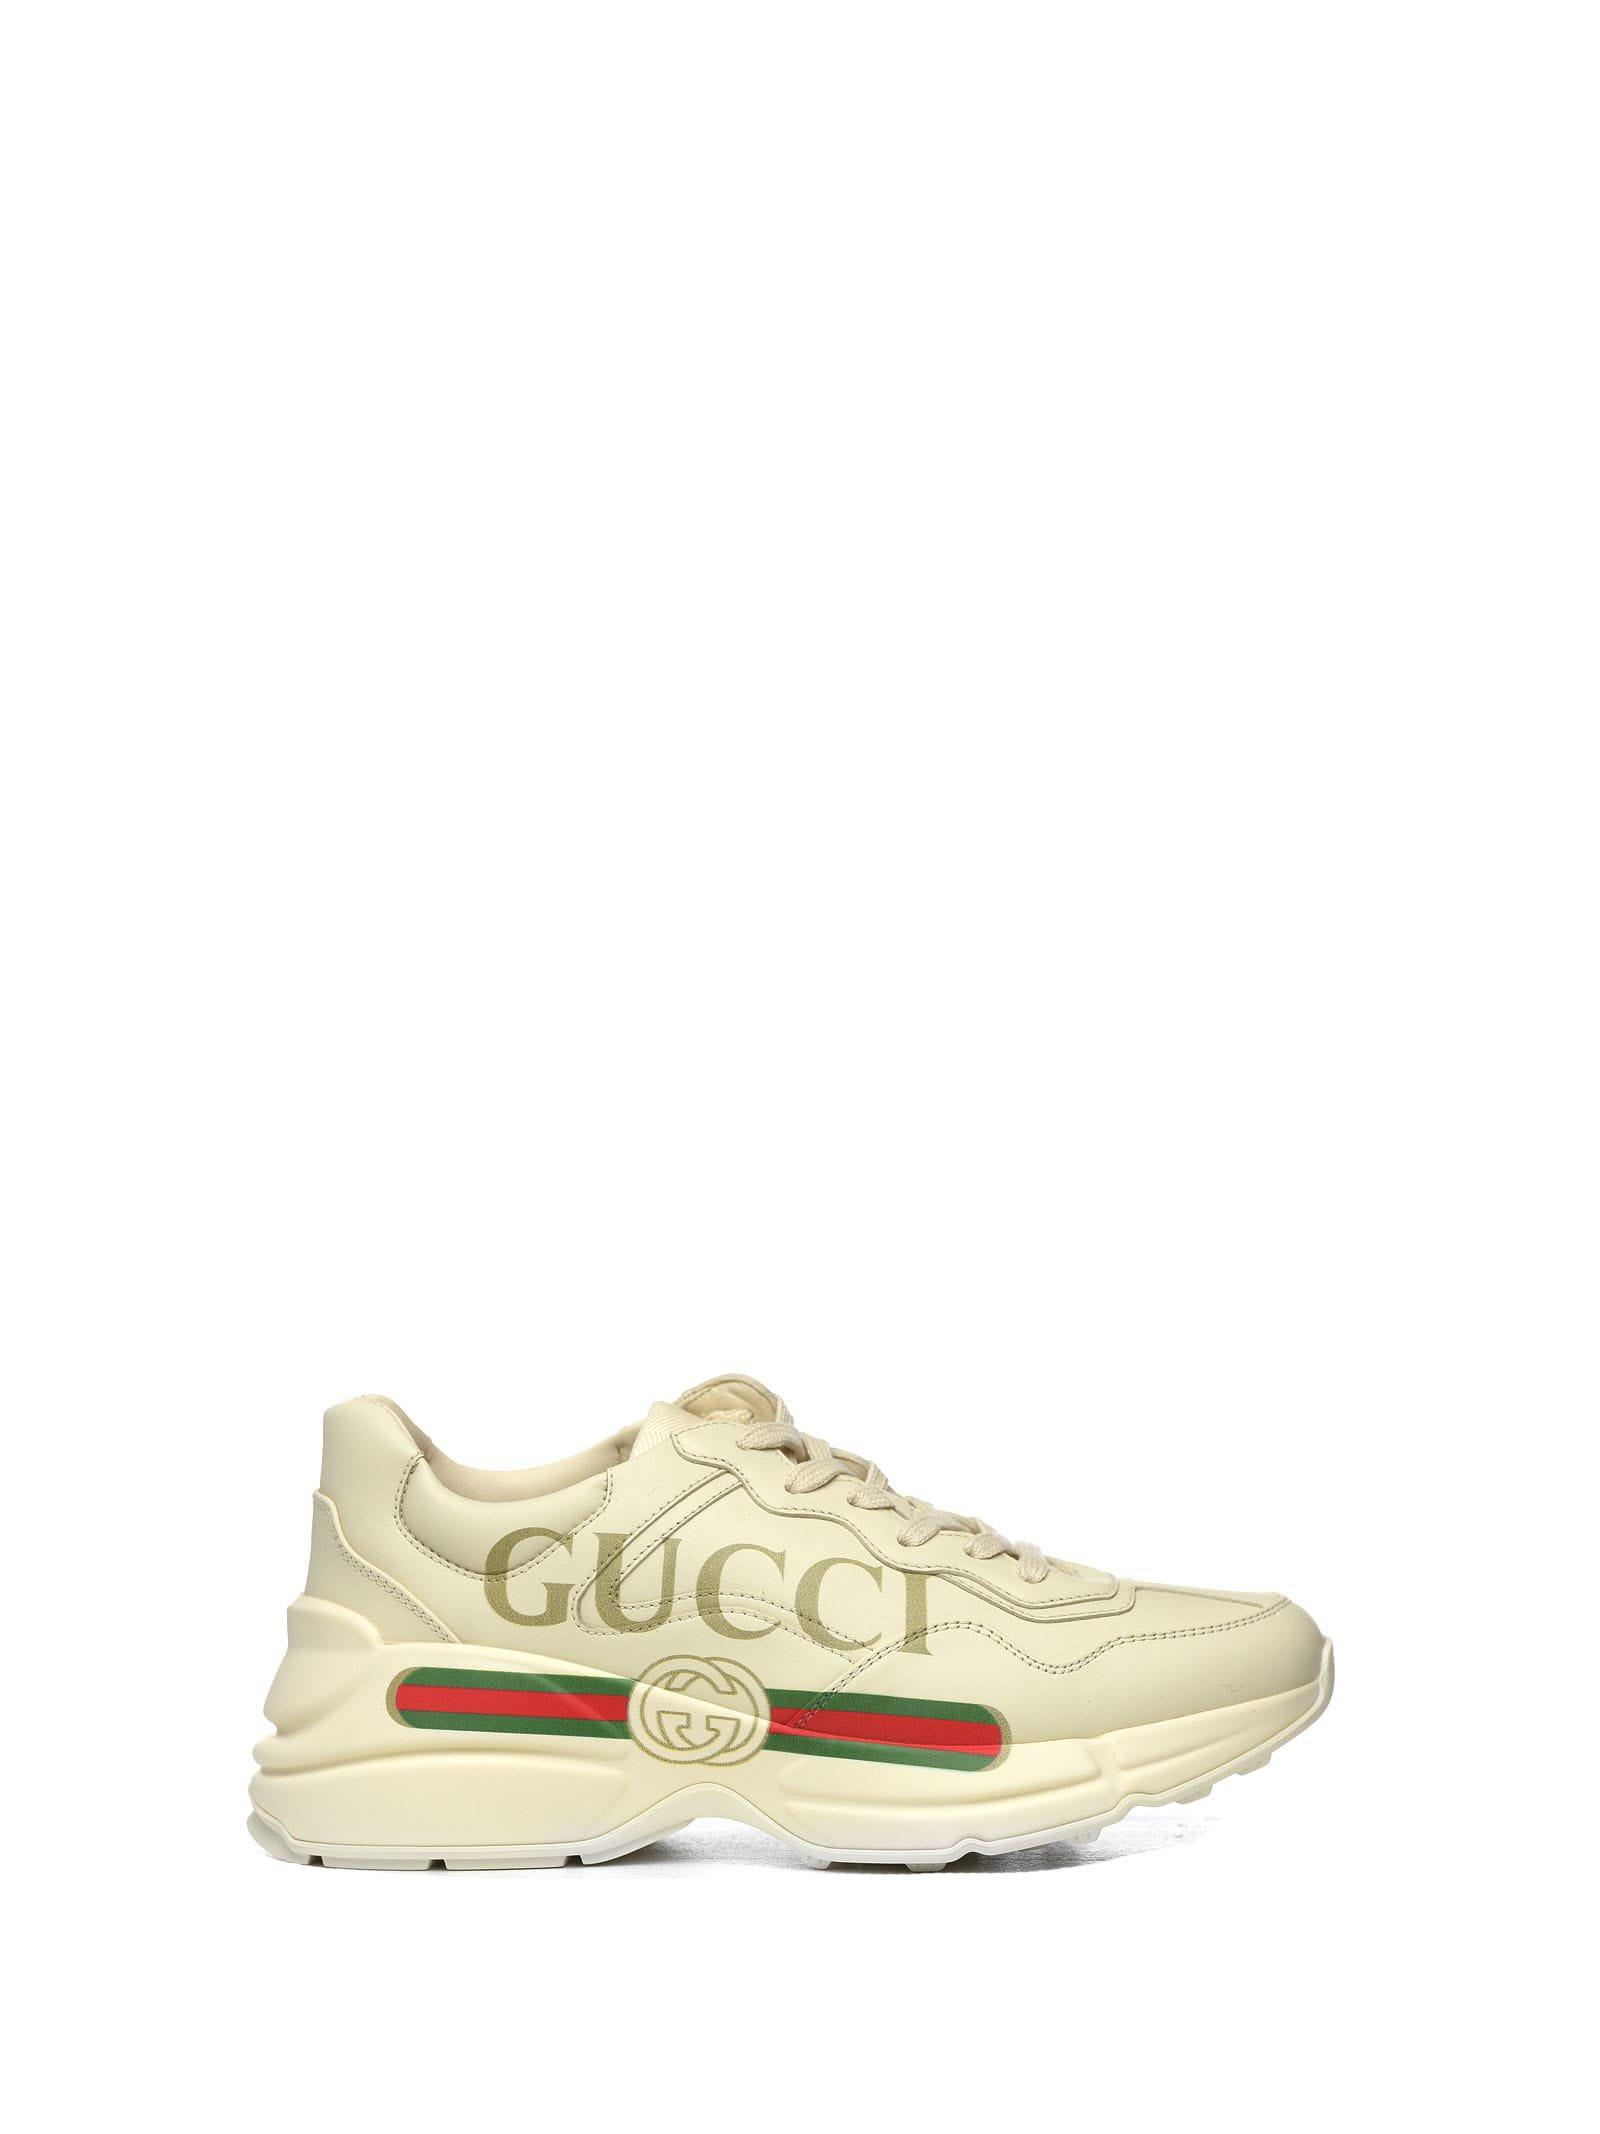 Gucci Gucci Rhyton Sneakers